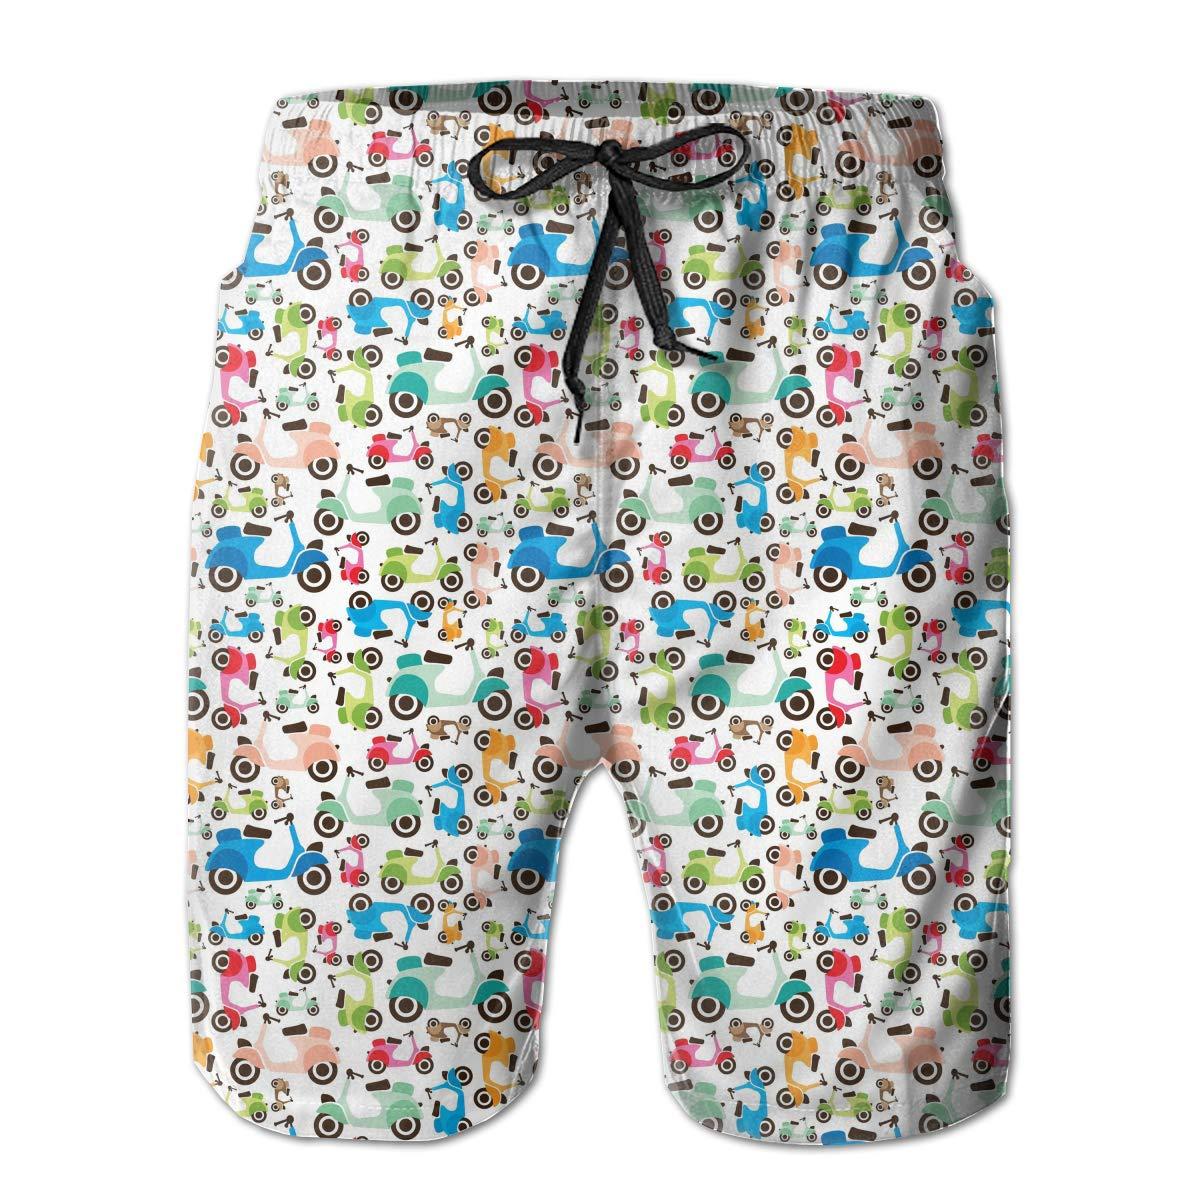 Colorful Electric Vehicle Swim Shorts Mens Swim Trunks Beach Shorts Board Shorts